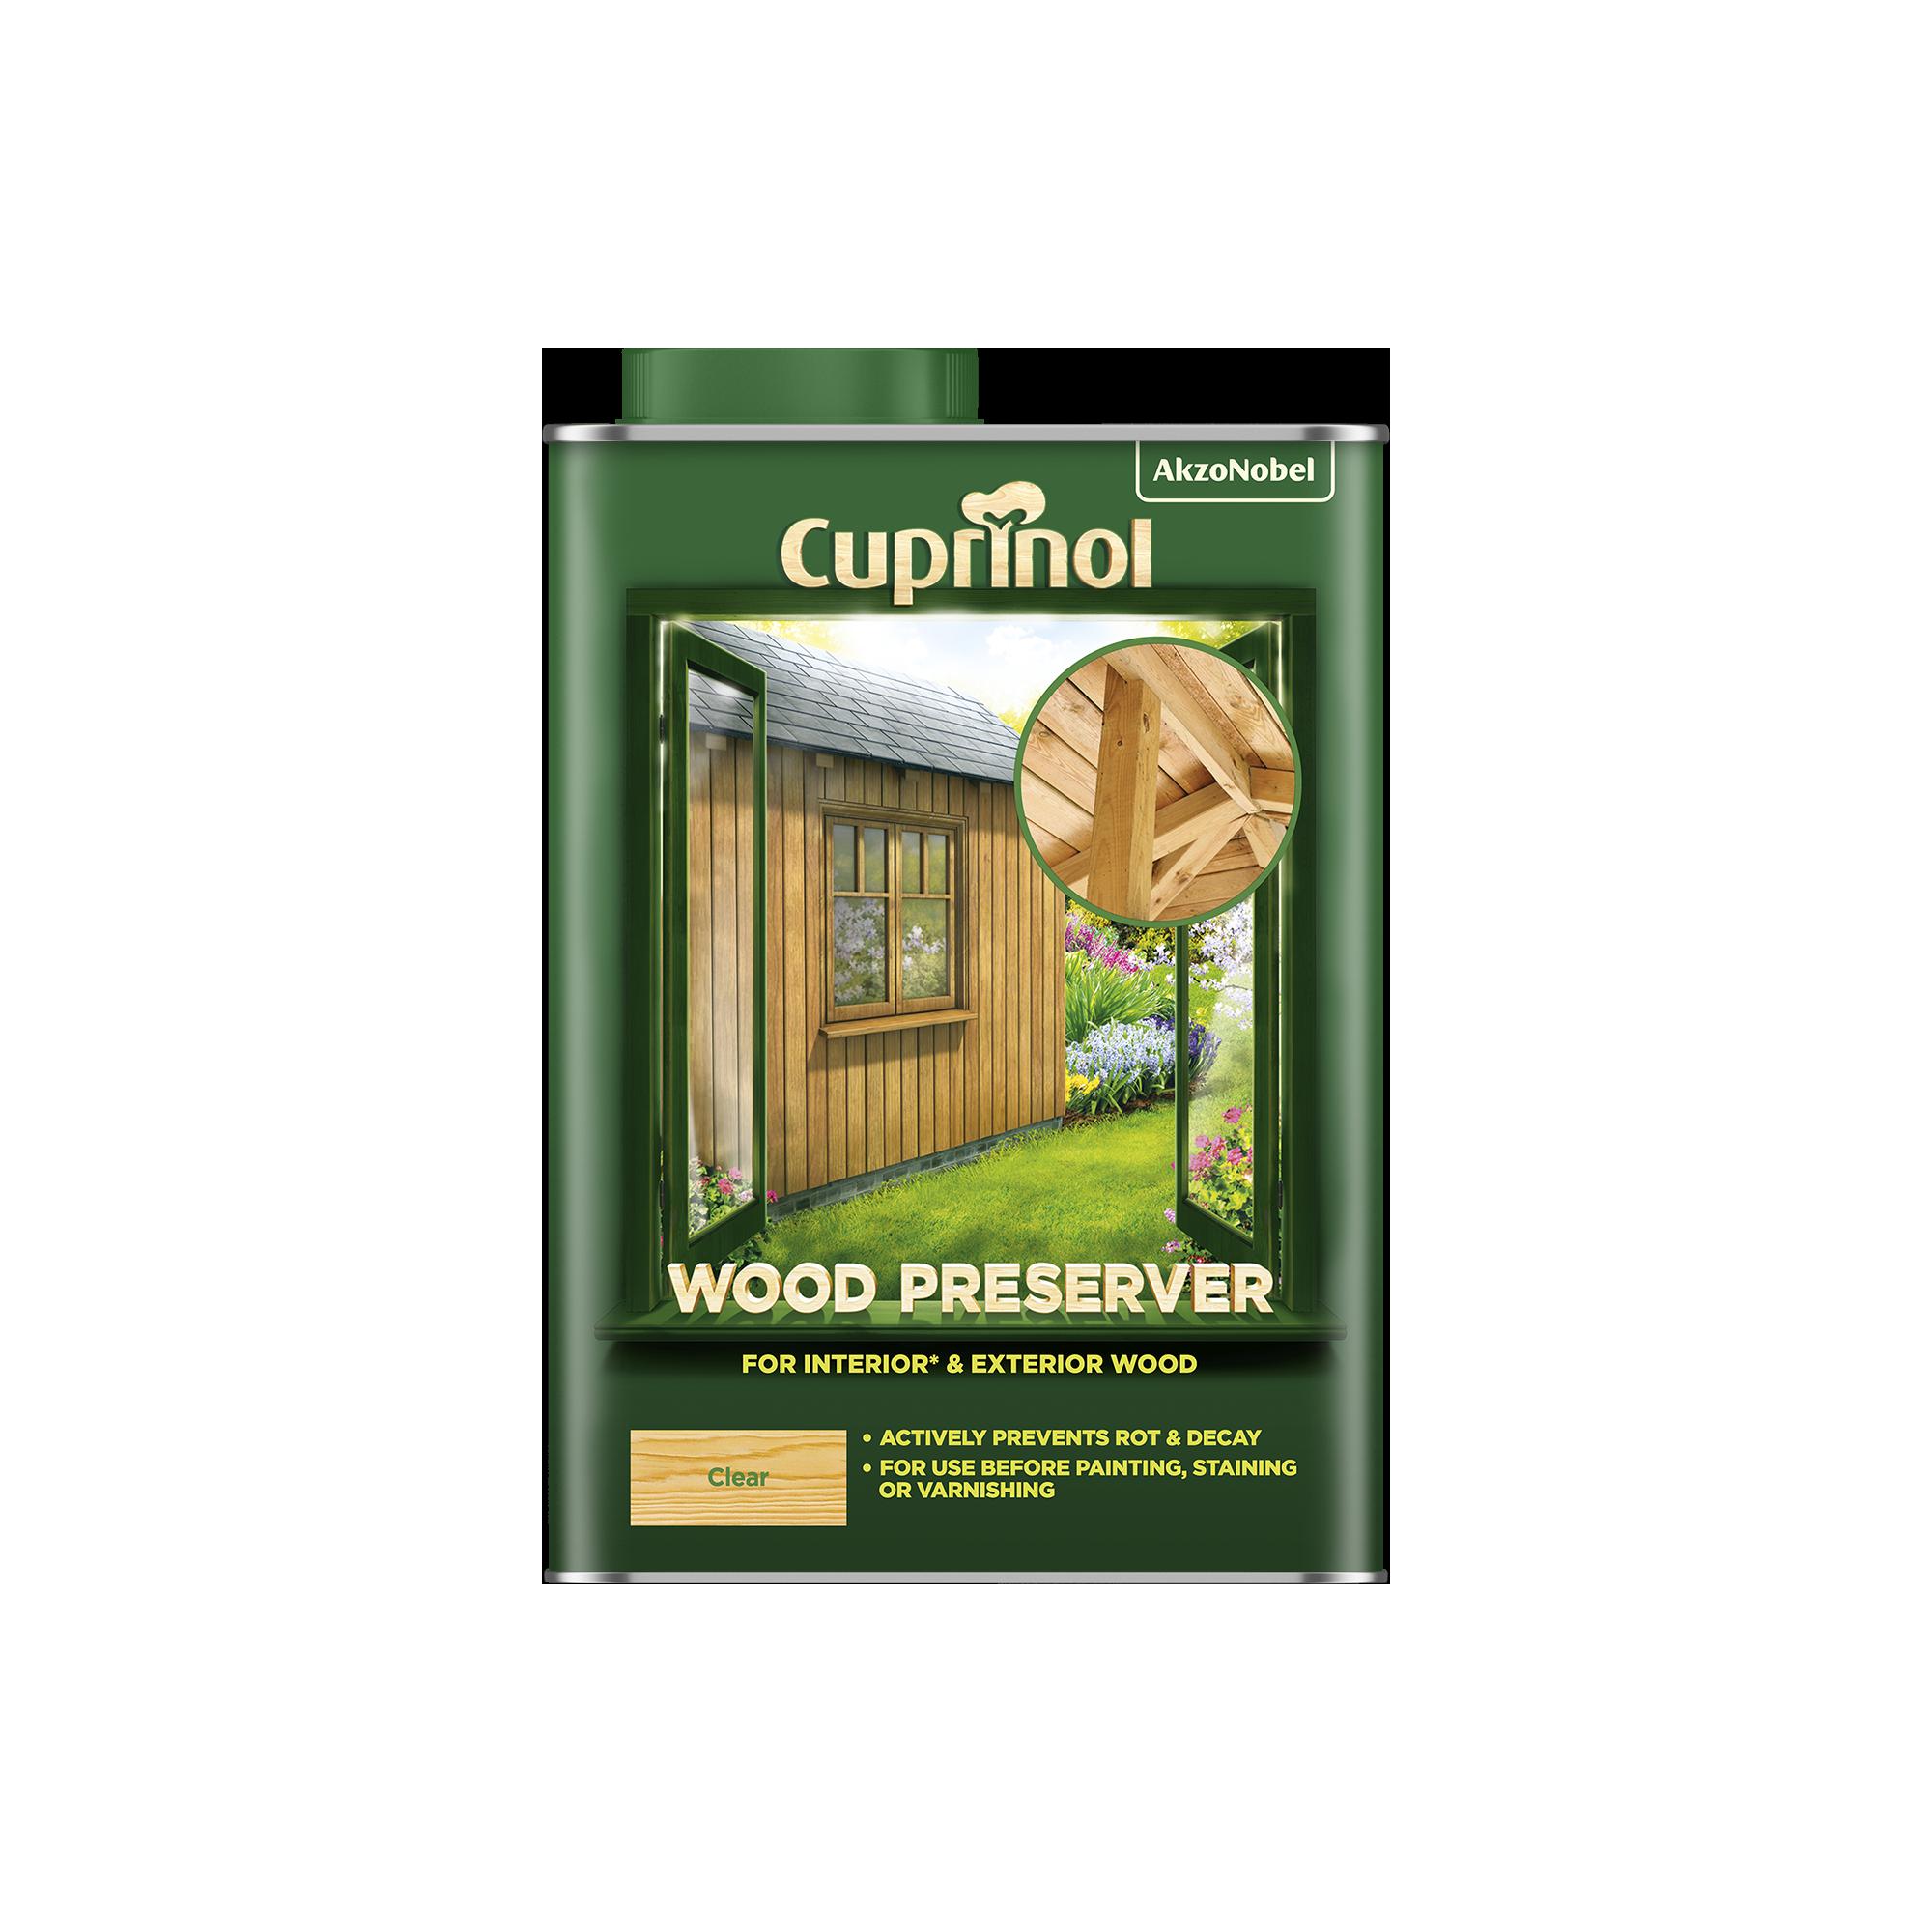 Cuprinol Wood Preserver Clear (BP)